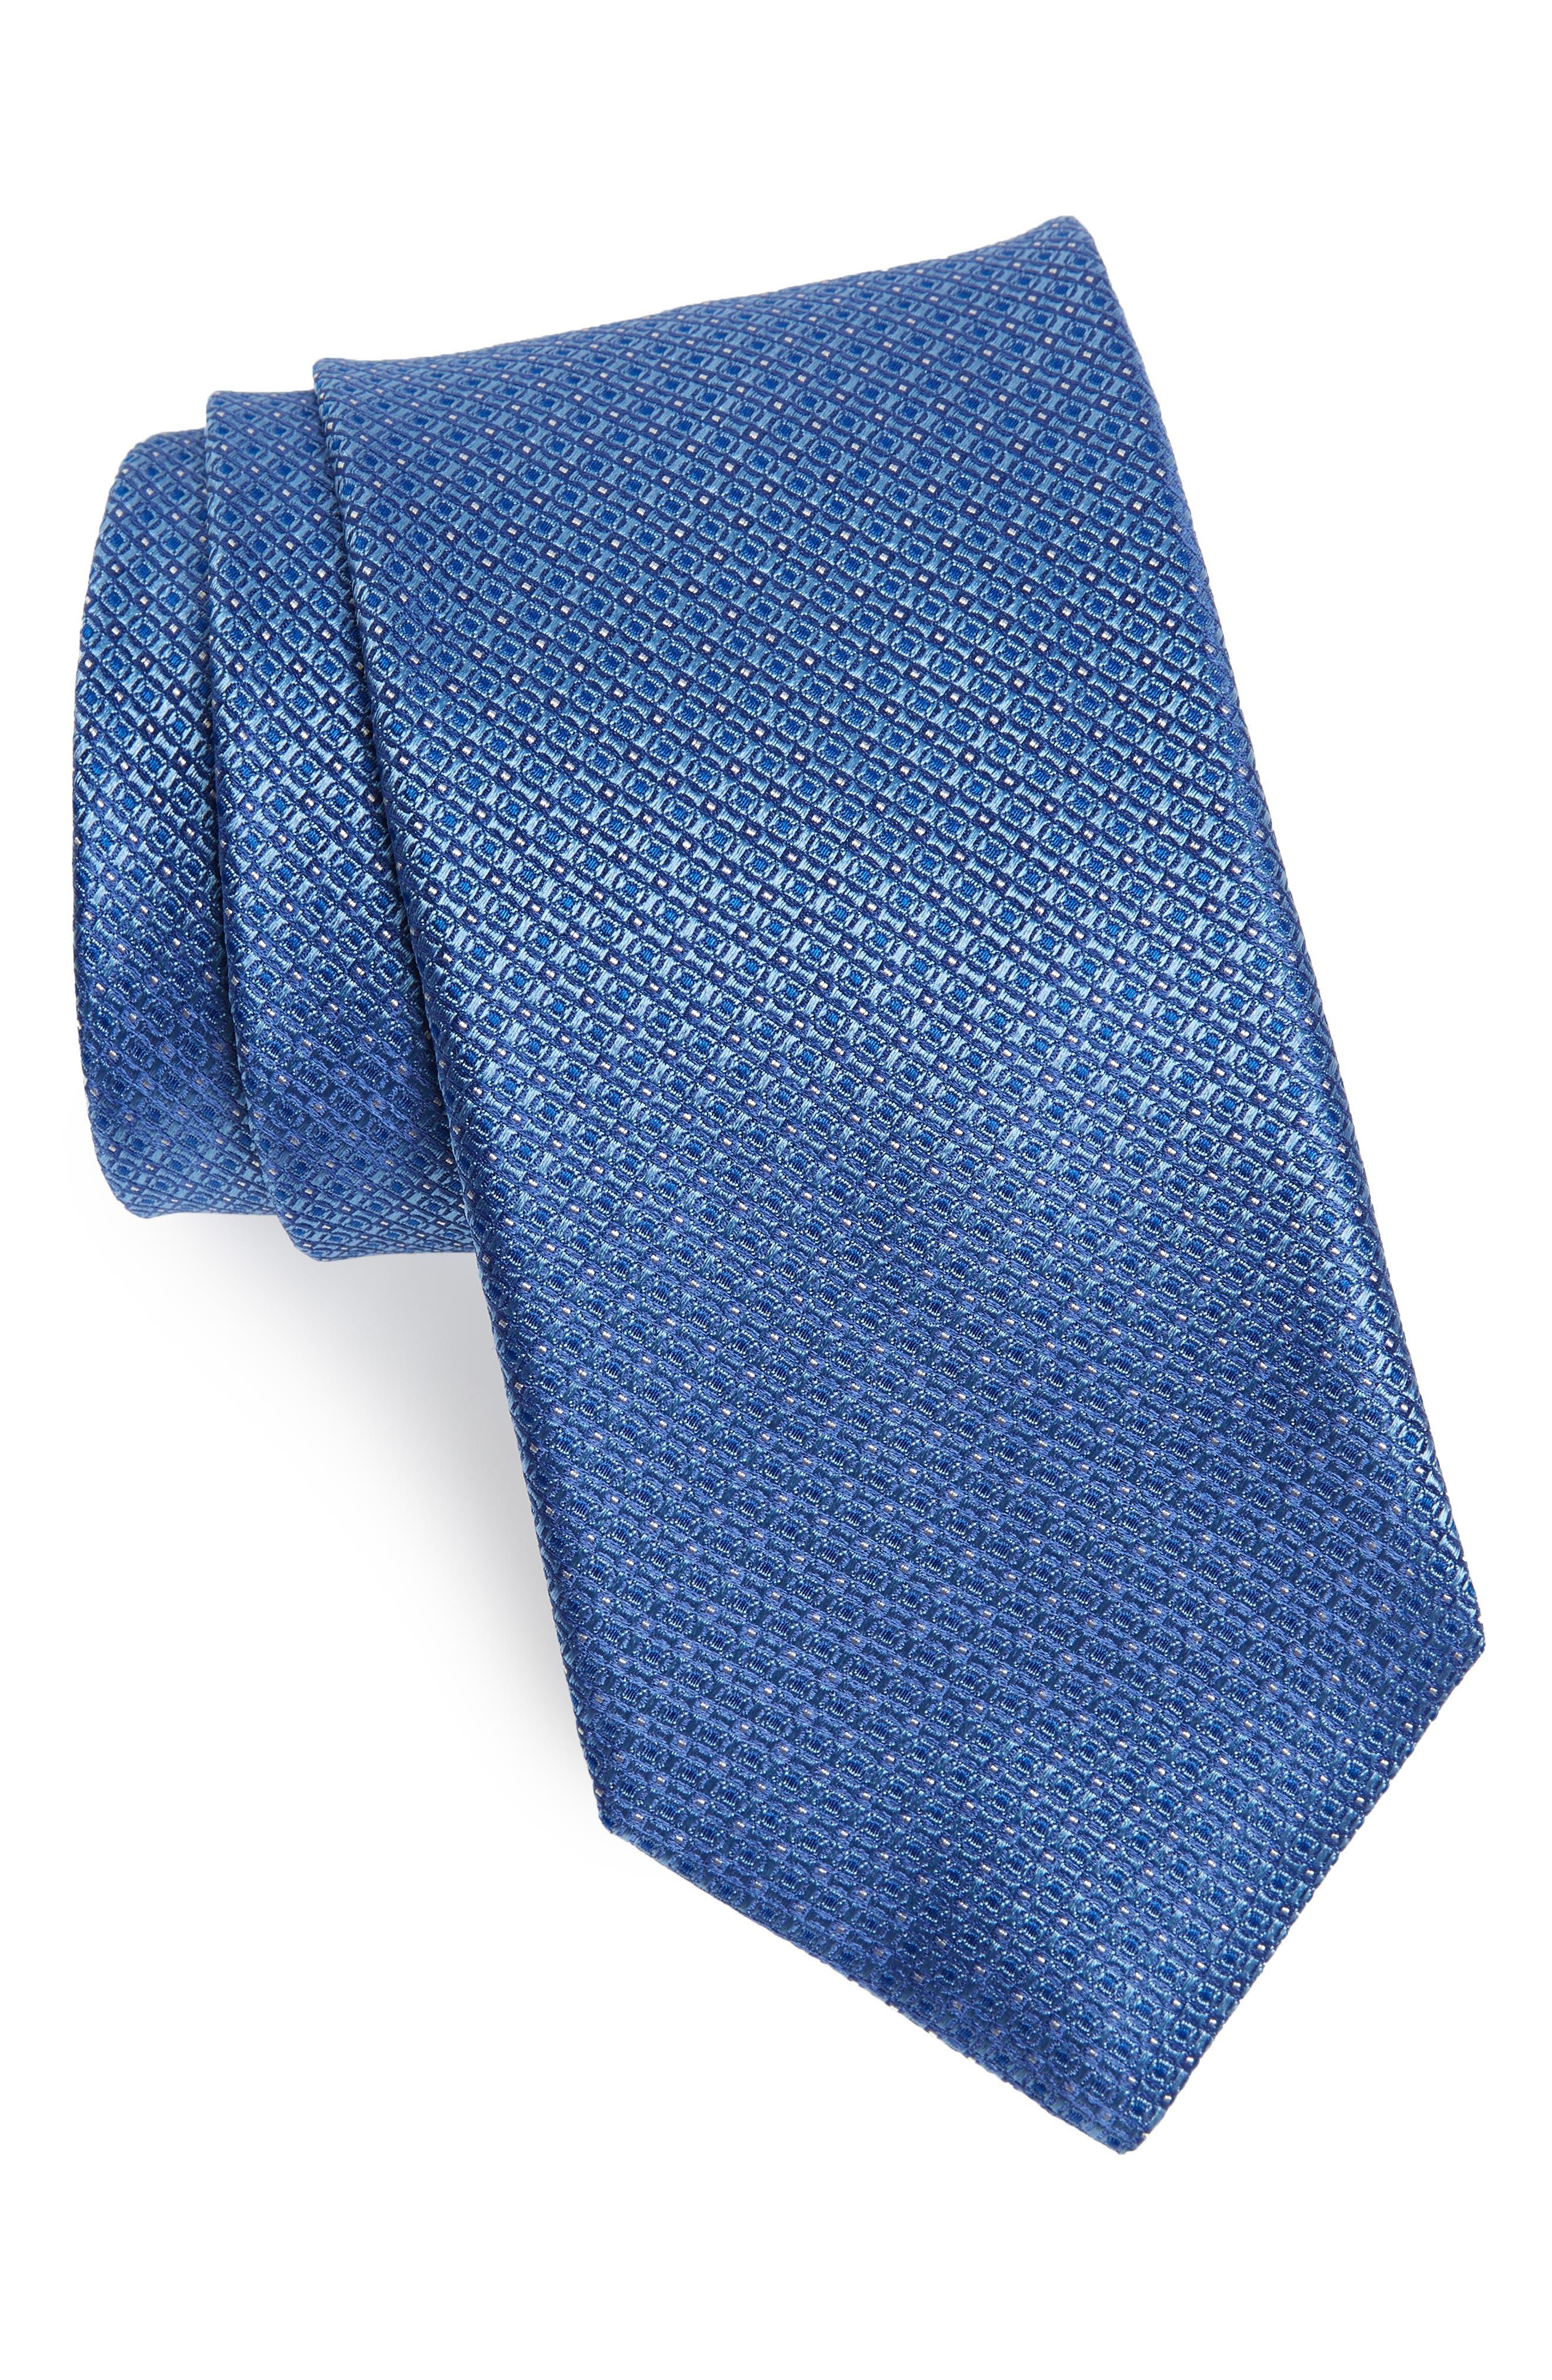 Neat Silk Tie,                             Main thumbnail 1, color,                             LIGHT BLUE